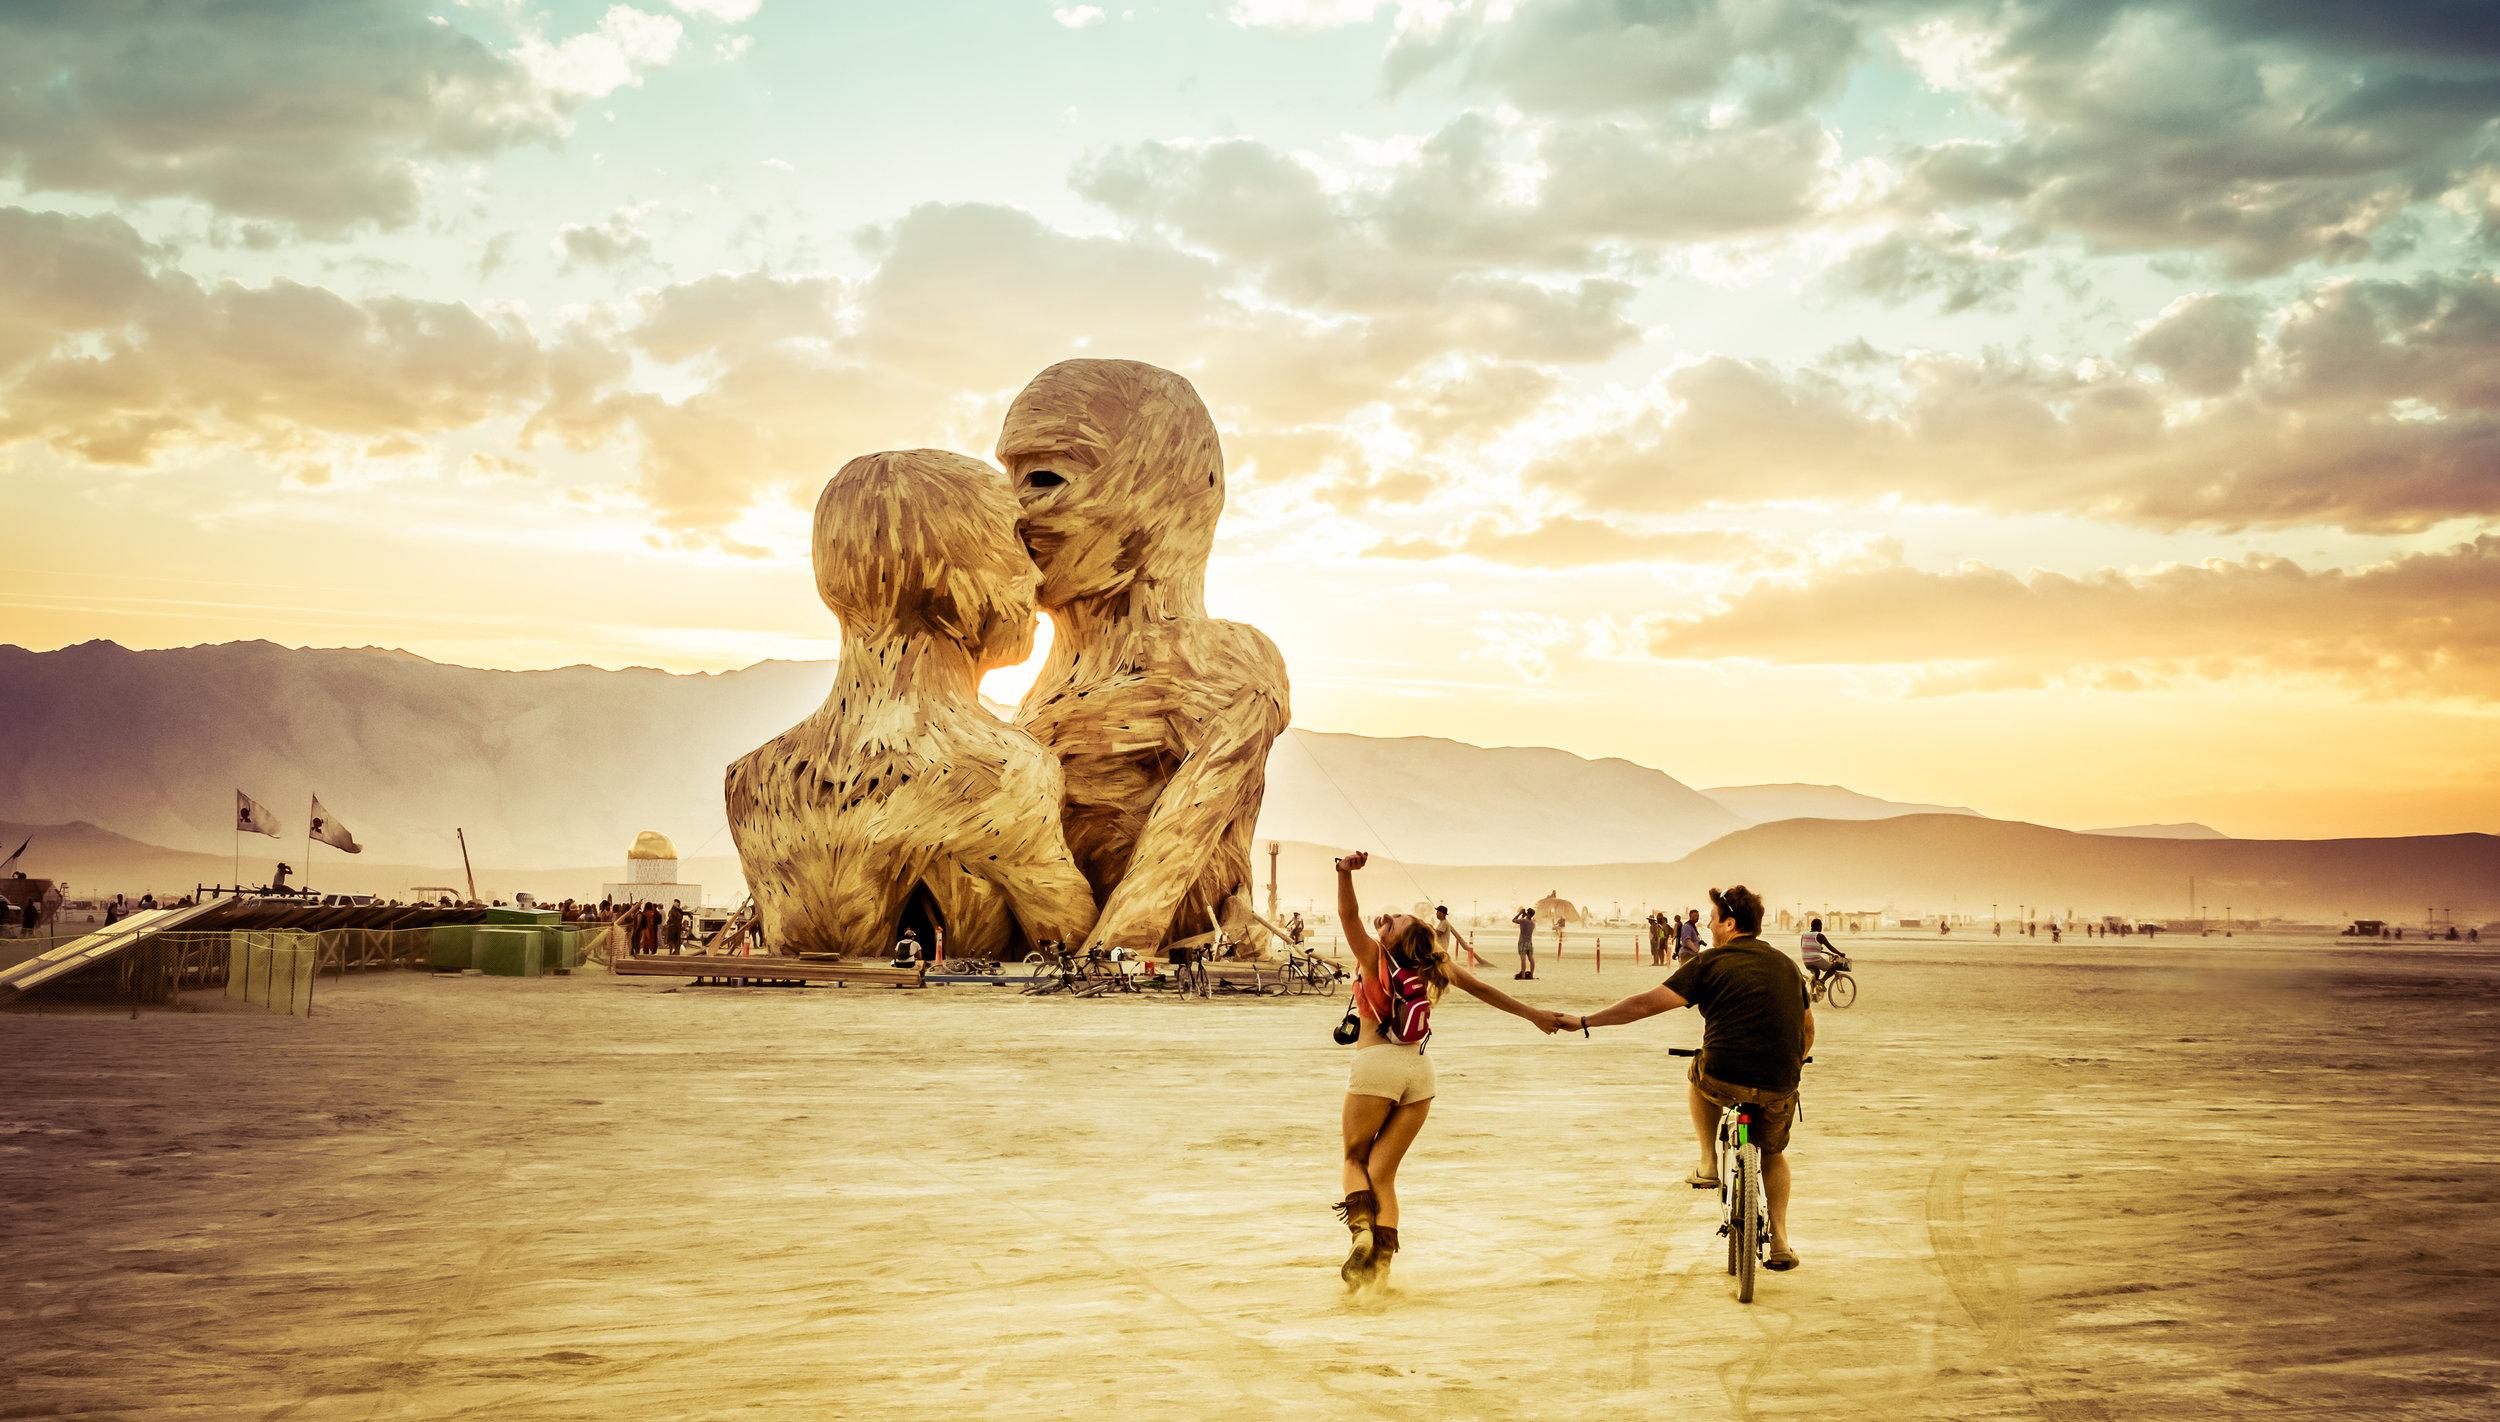 Photo of my wife and I headed towards Embrace at Burning Man 2014 courtesy    Trey Ratcliff   .